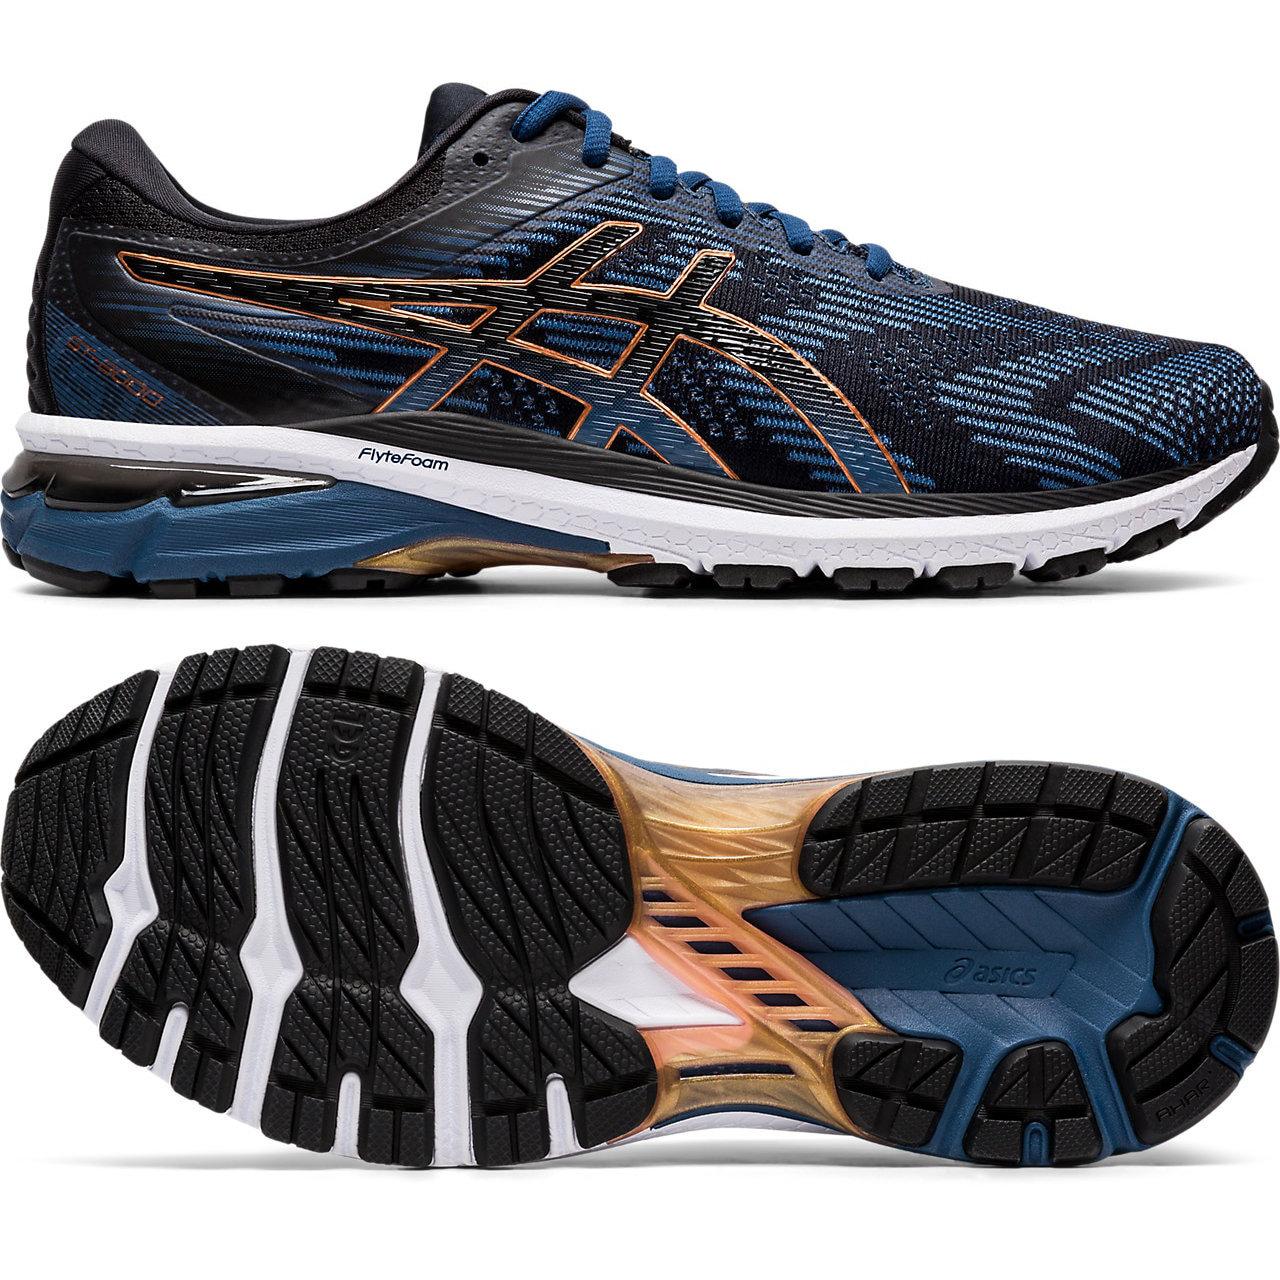 Asics GT-2000 8 Mens Running Shoes - Blue/Black, 8 UK